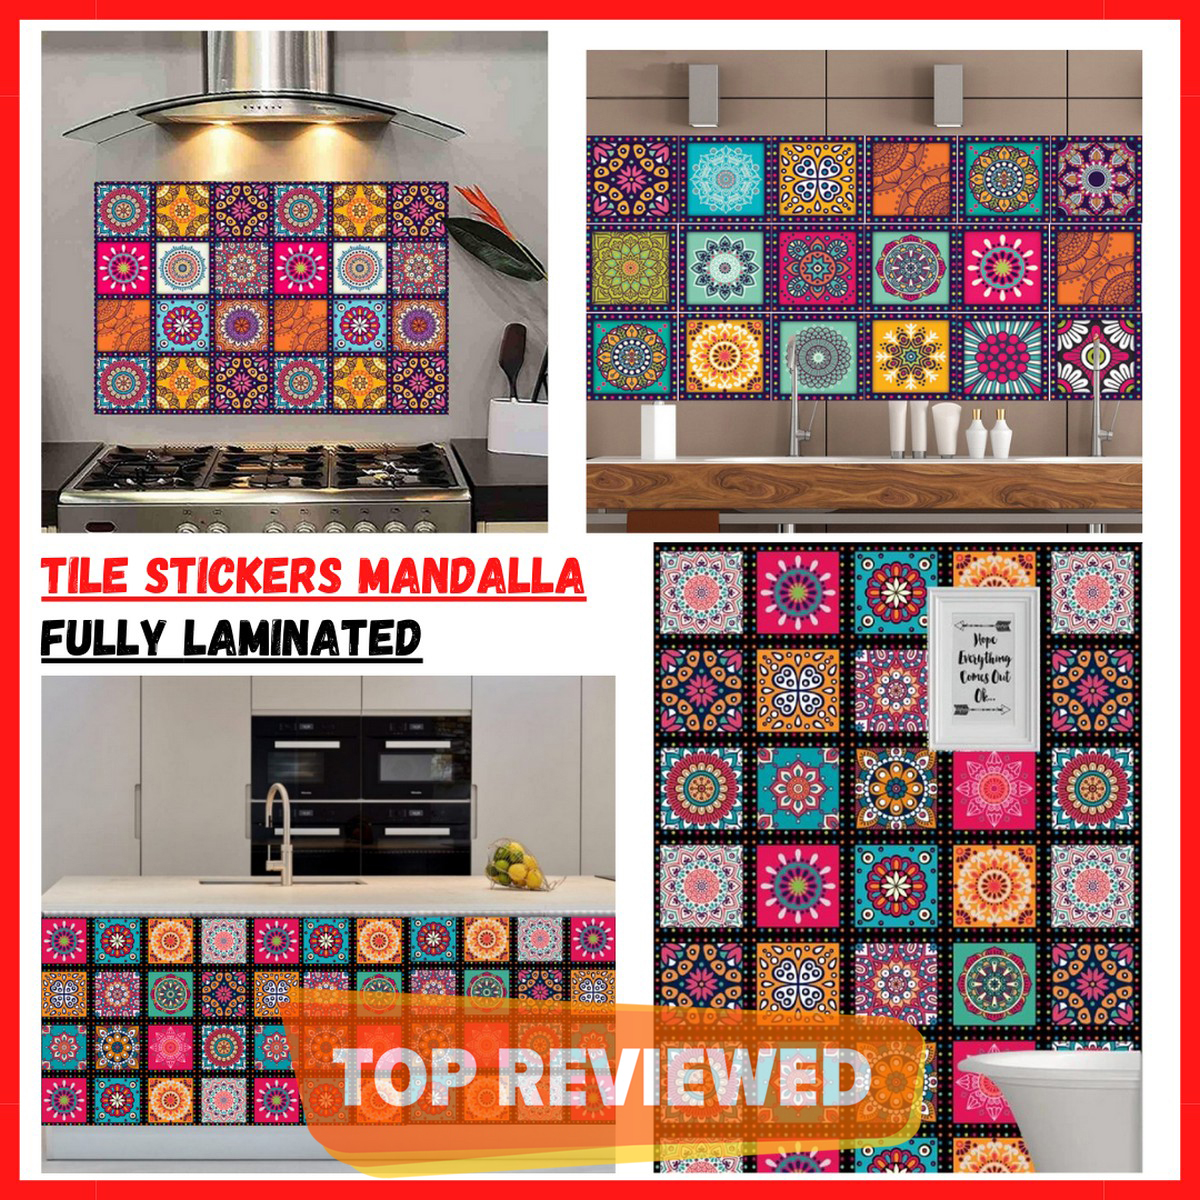 Tile Stickers Pack of 12  Flower Pattern Mandala Design Wall Decorative Self Adhesive Tiles Stickers Bathroom Kitchen Sticker Wall Wallpaper Border Decoration Giga